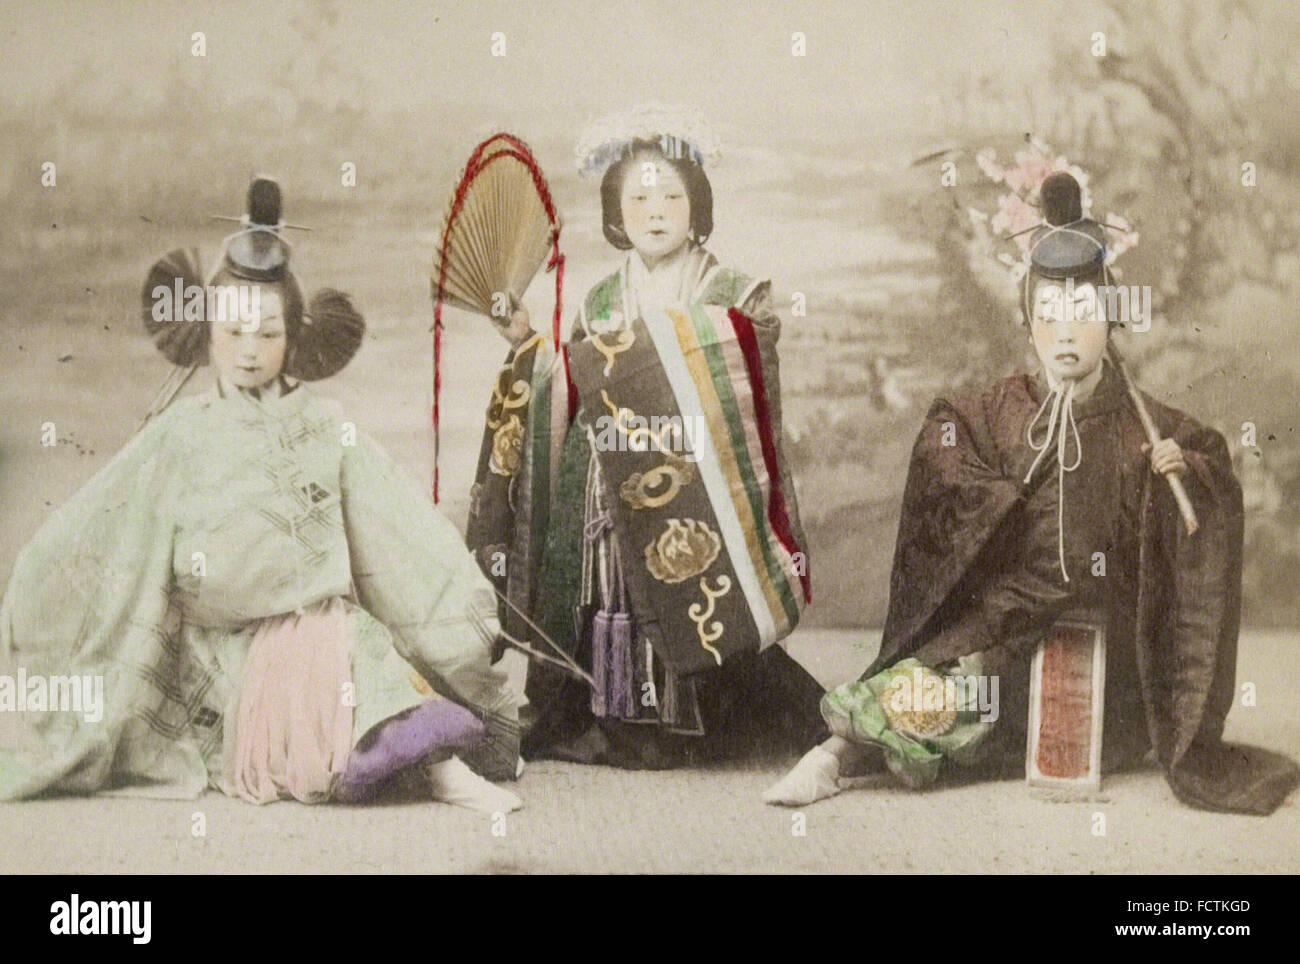 Kusakabe Kimbei - Mädchen historischer Tanz Stockbild